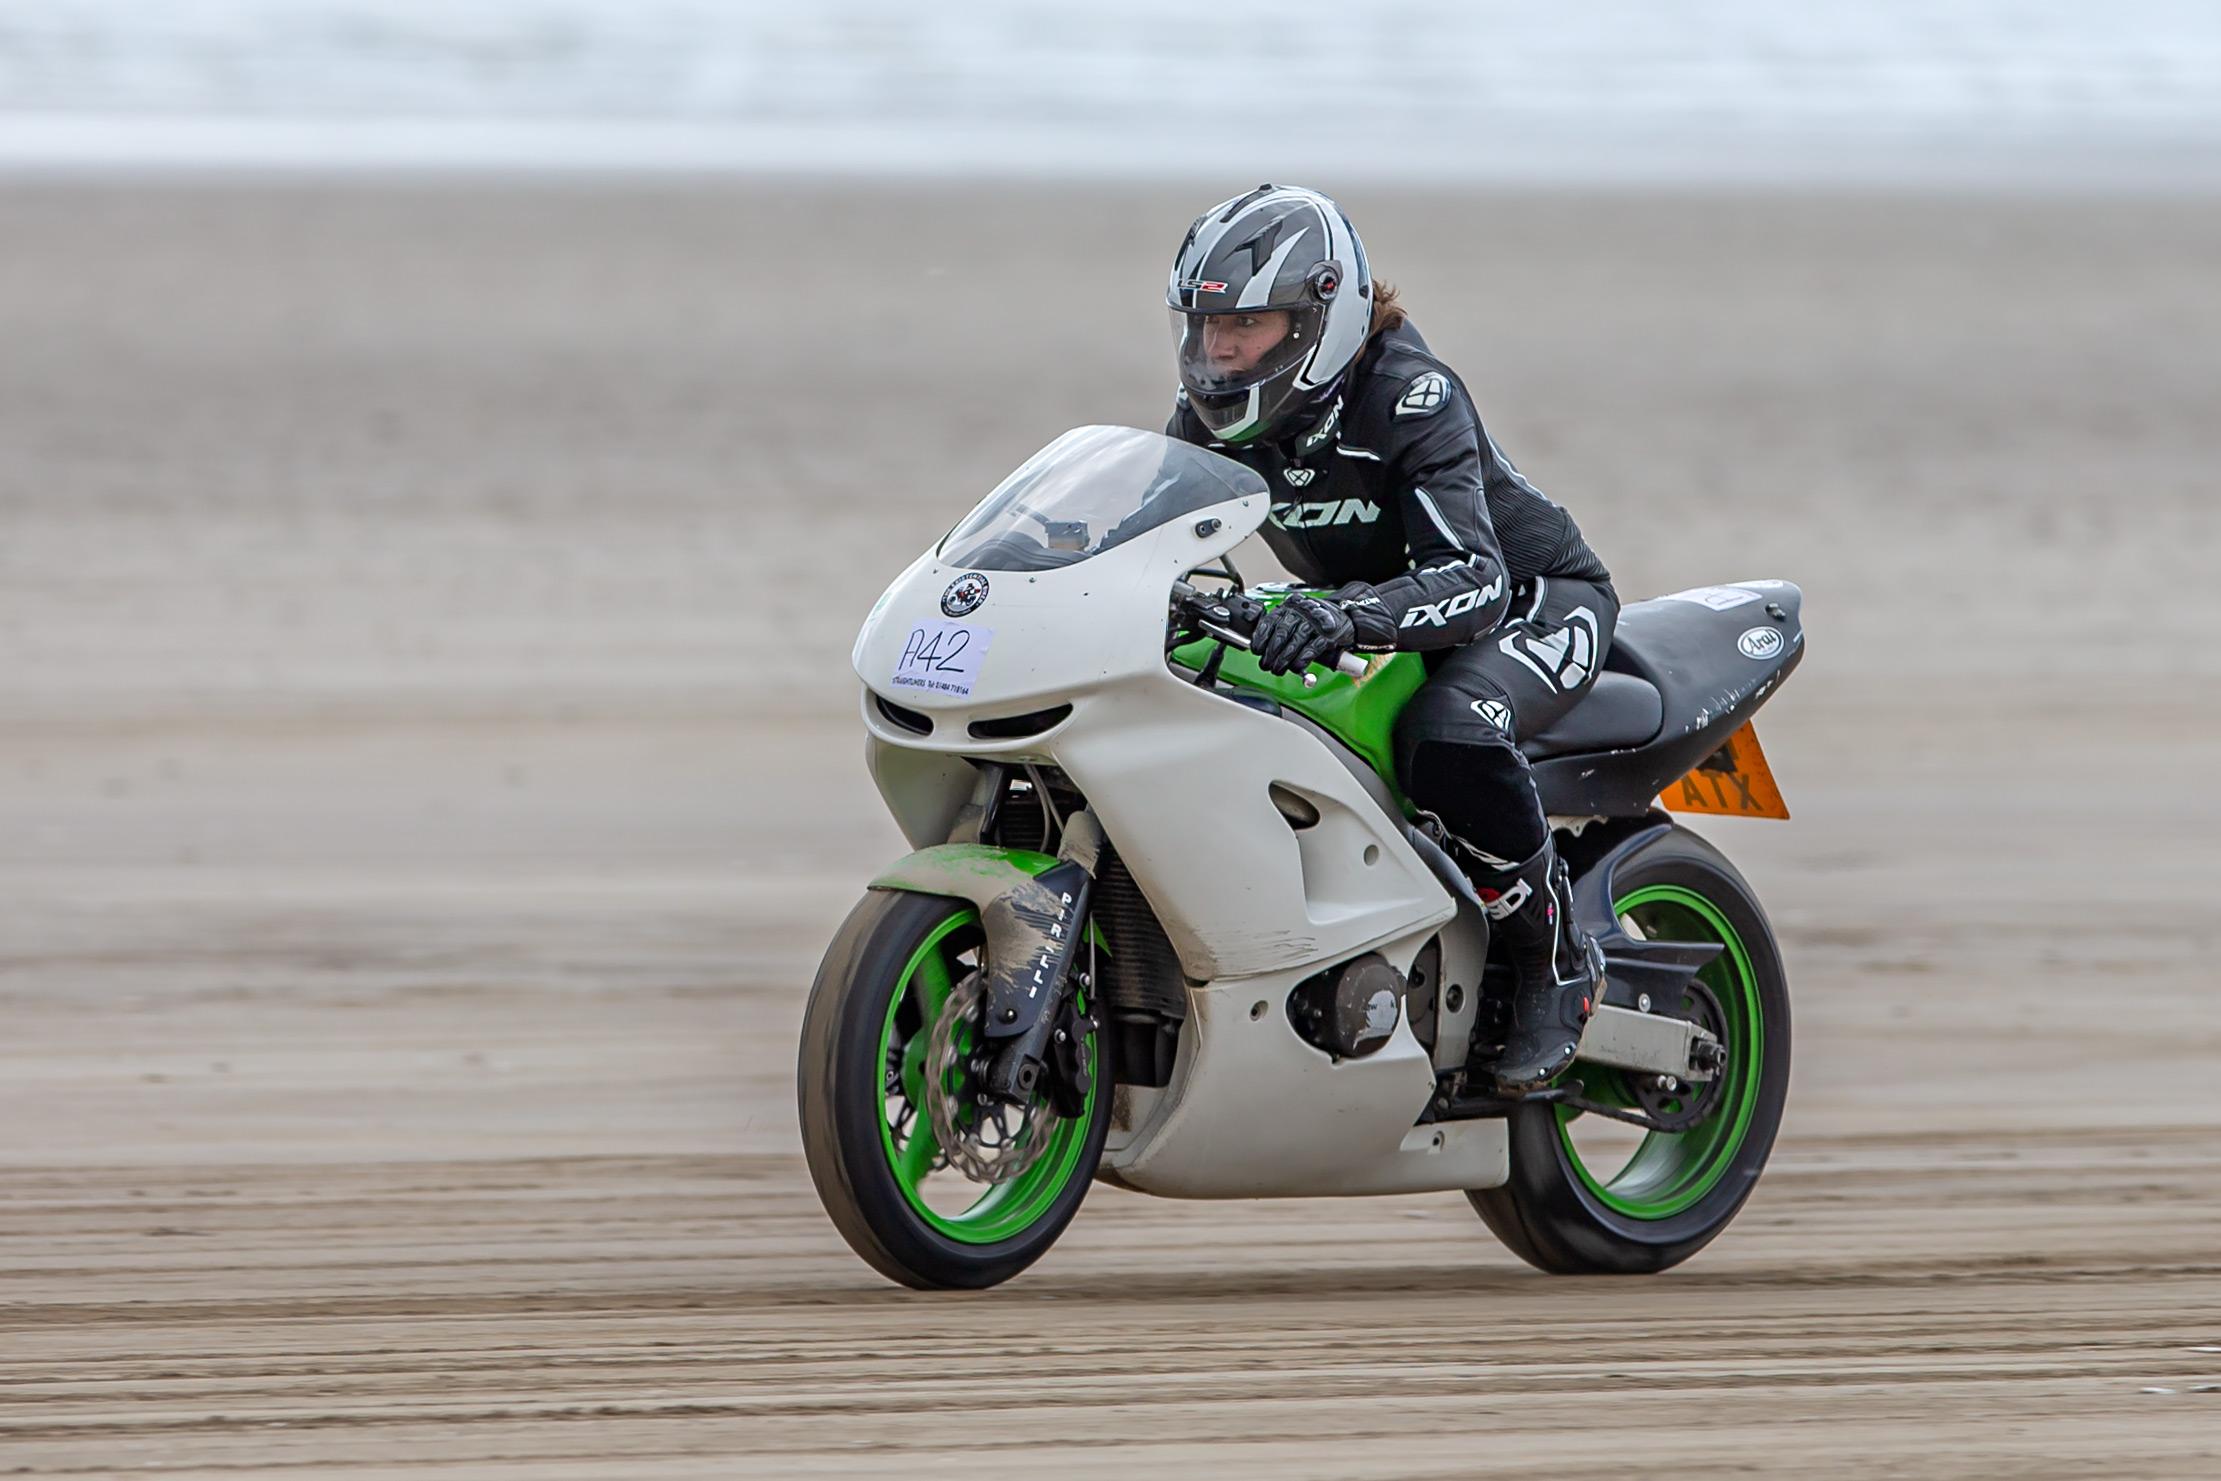 Louisa-Swaden-Adventure-Rider-Radio-Motorcycle-Podcast-2.jpg